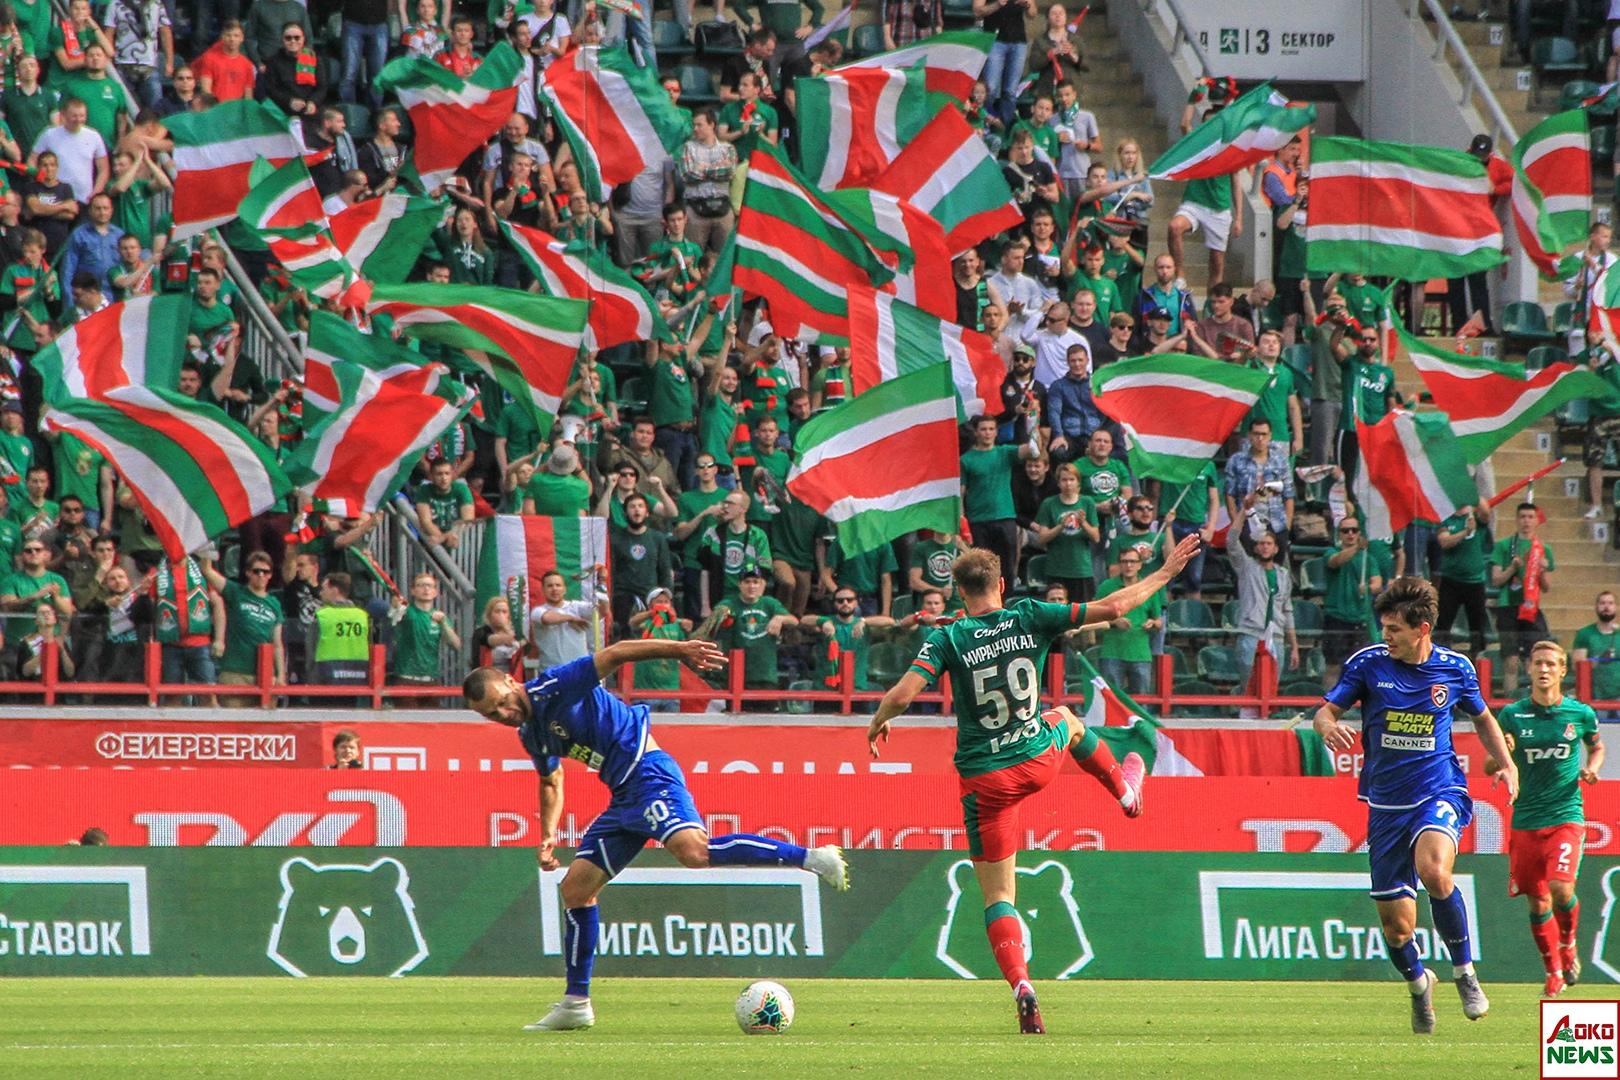 Локомотив - Тамбов. Фото: Дмитрий Бурдонов / Loko.News